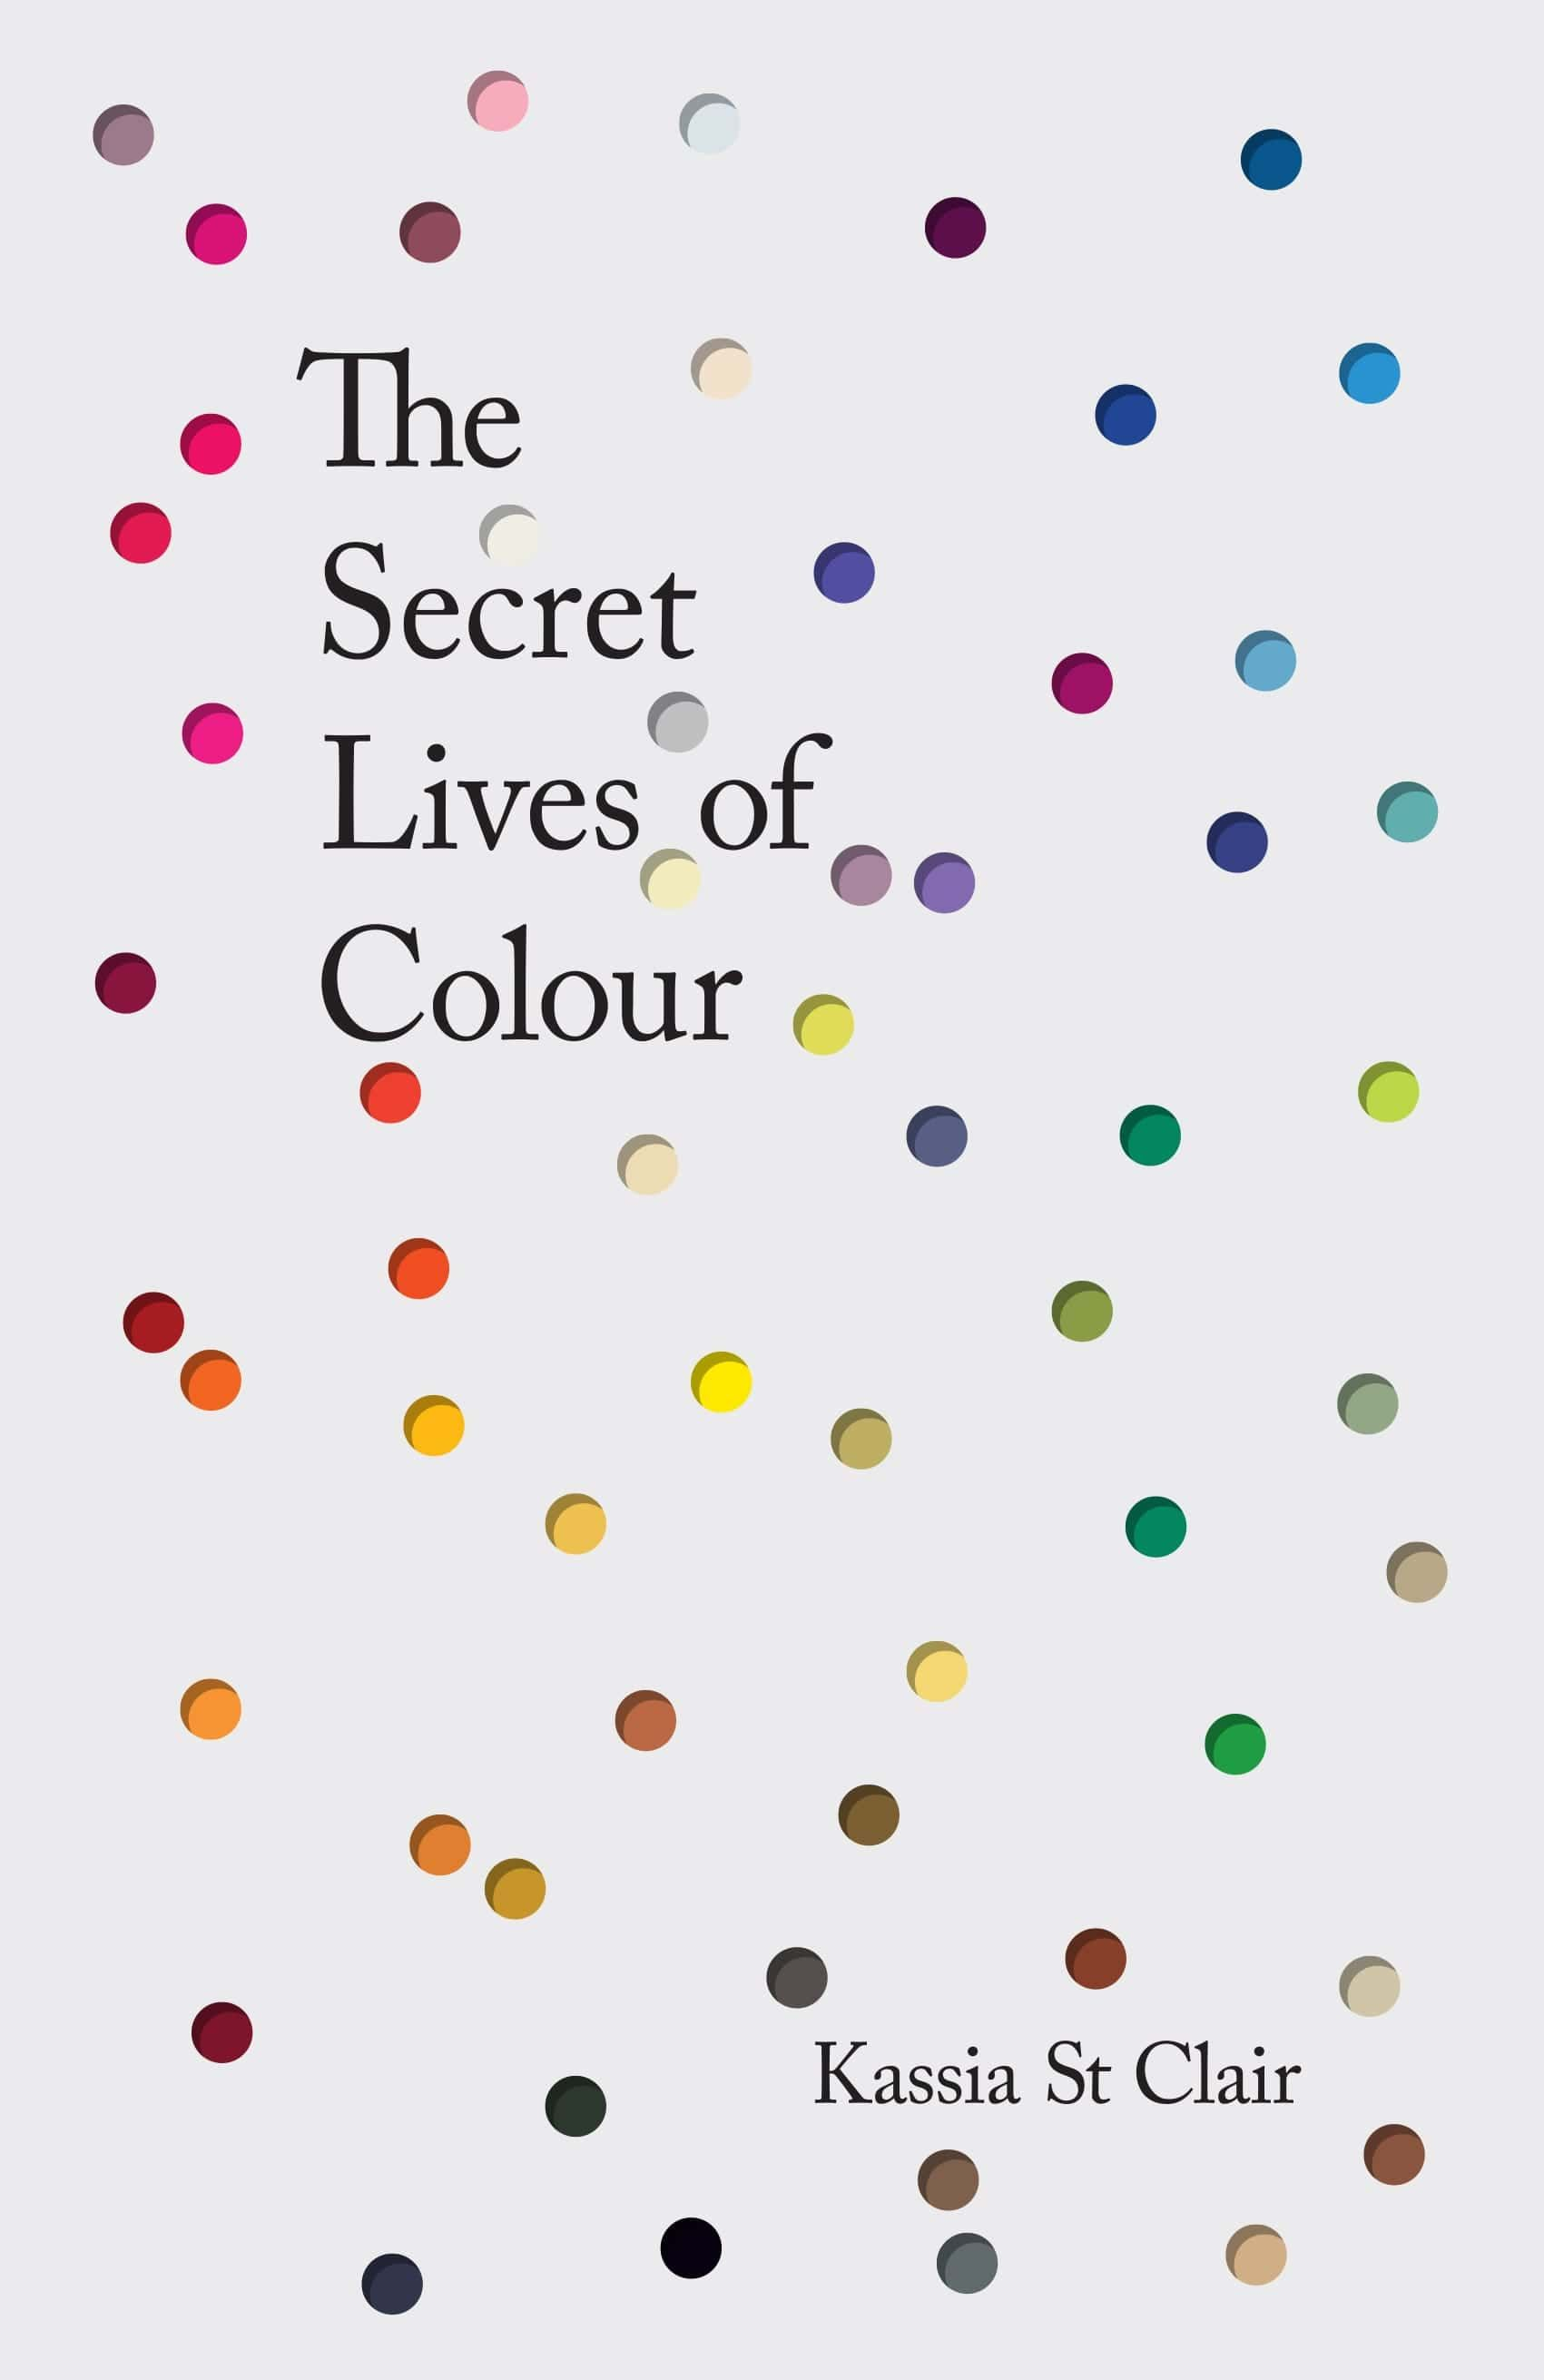 The_Secret_Lives_of_Colour___James_Edgar_design